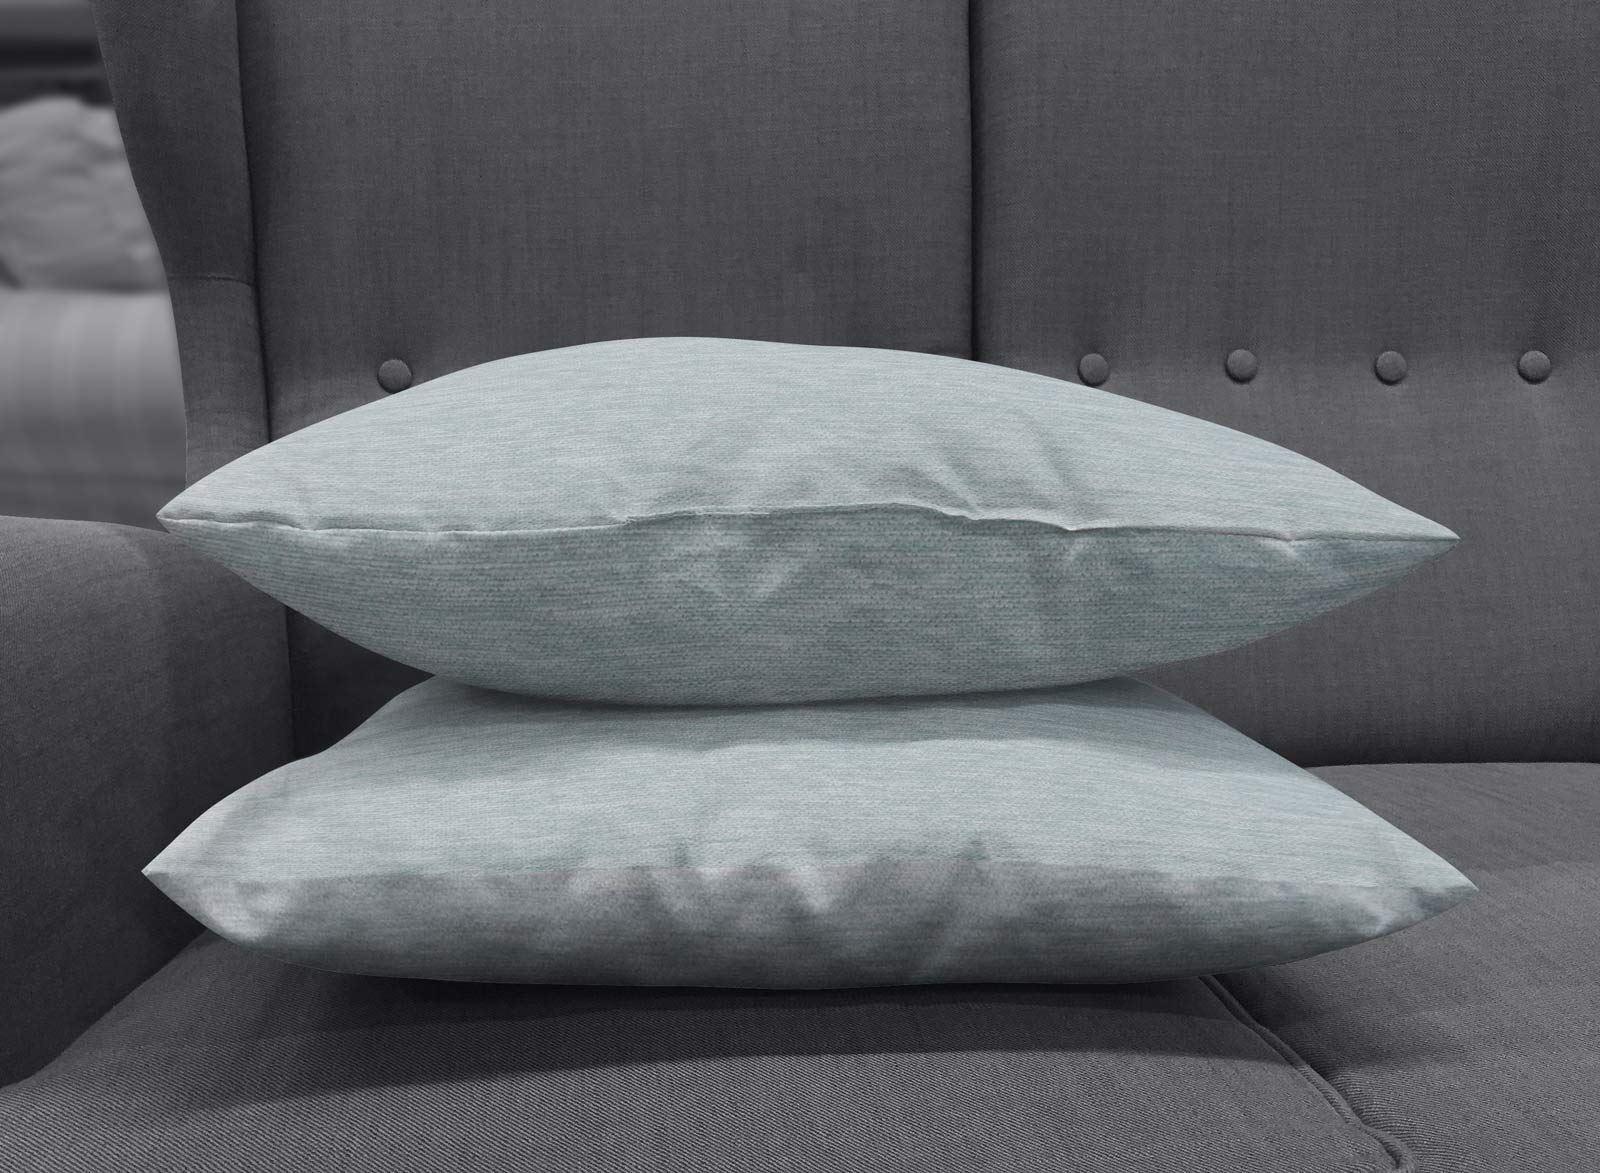 Set-of-2-Chenille-Cushion-Covers-Luxury-Plain-Cushions-Cover-Pairs-18-034-x-18-034 thumbnail 30